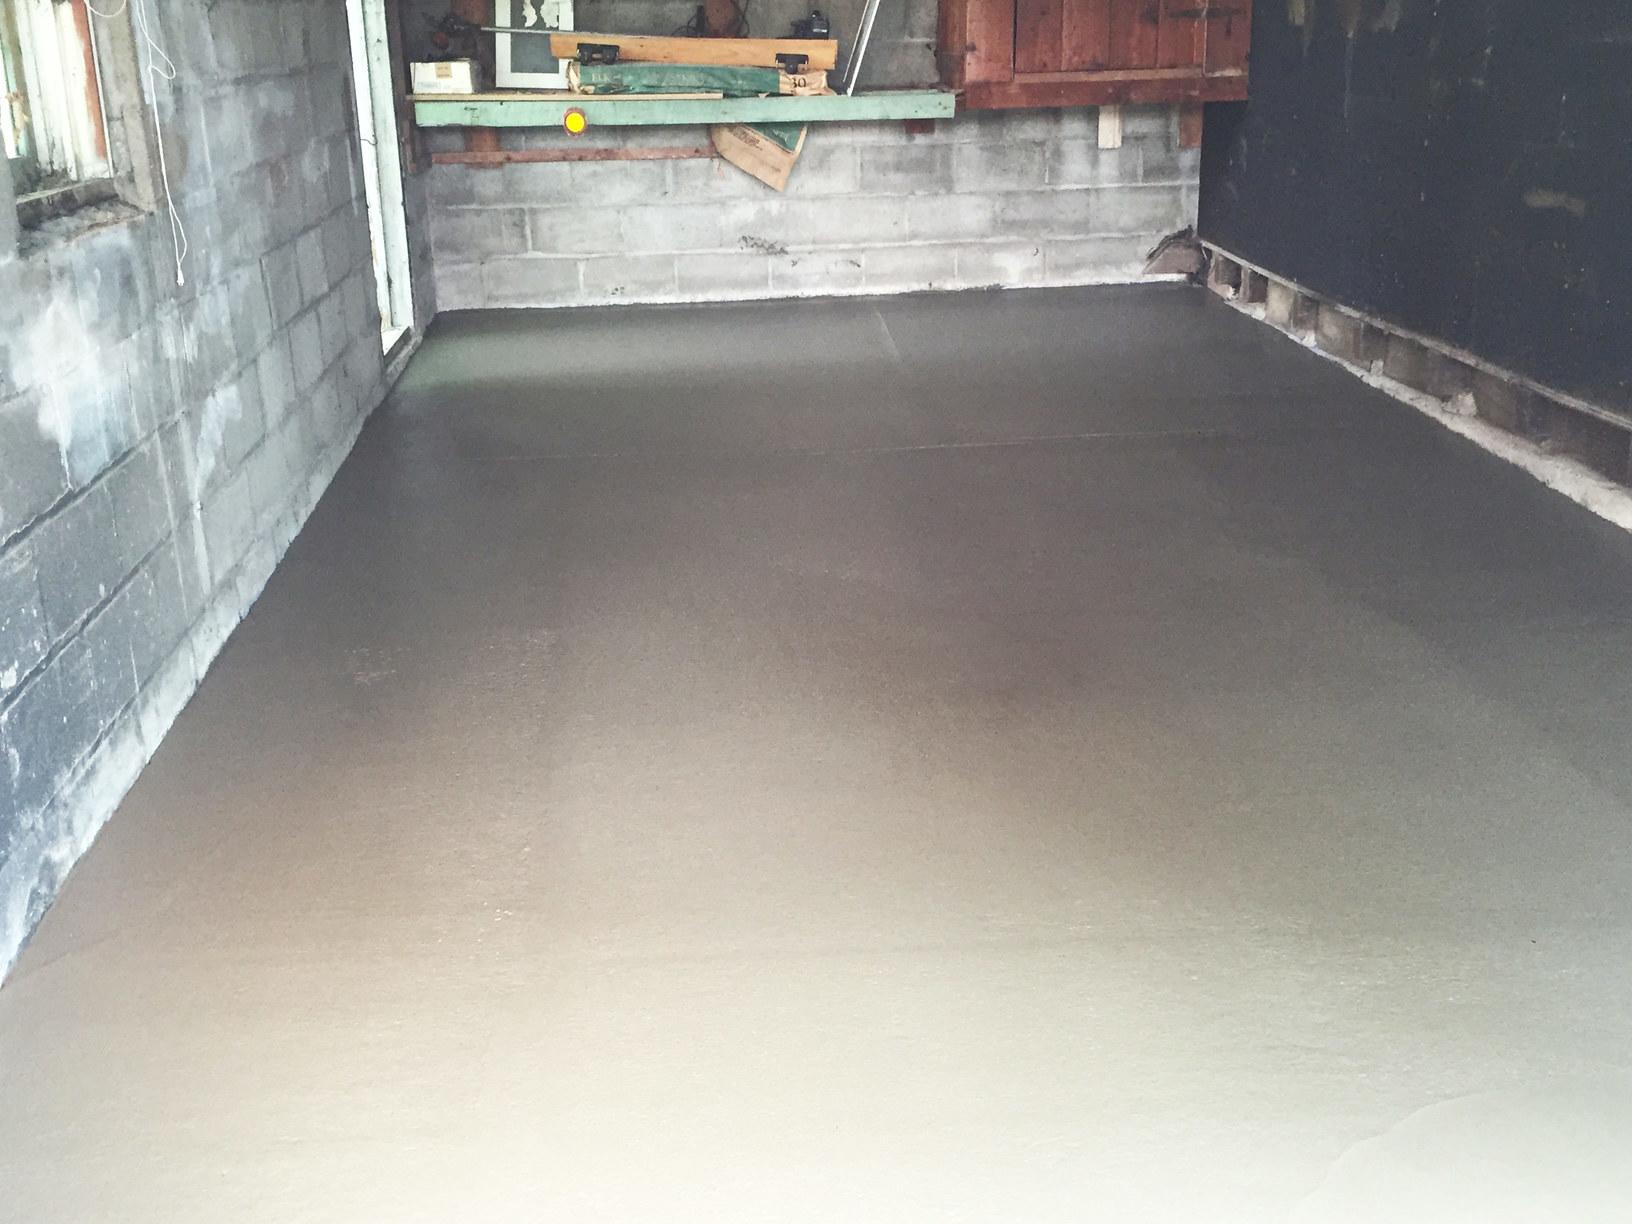 New Garage Floor - After Photo